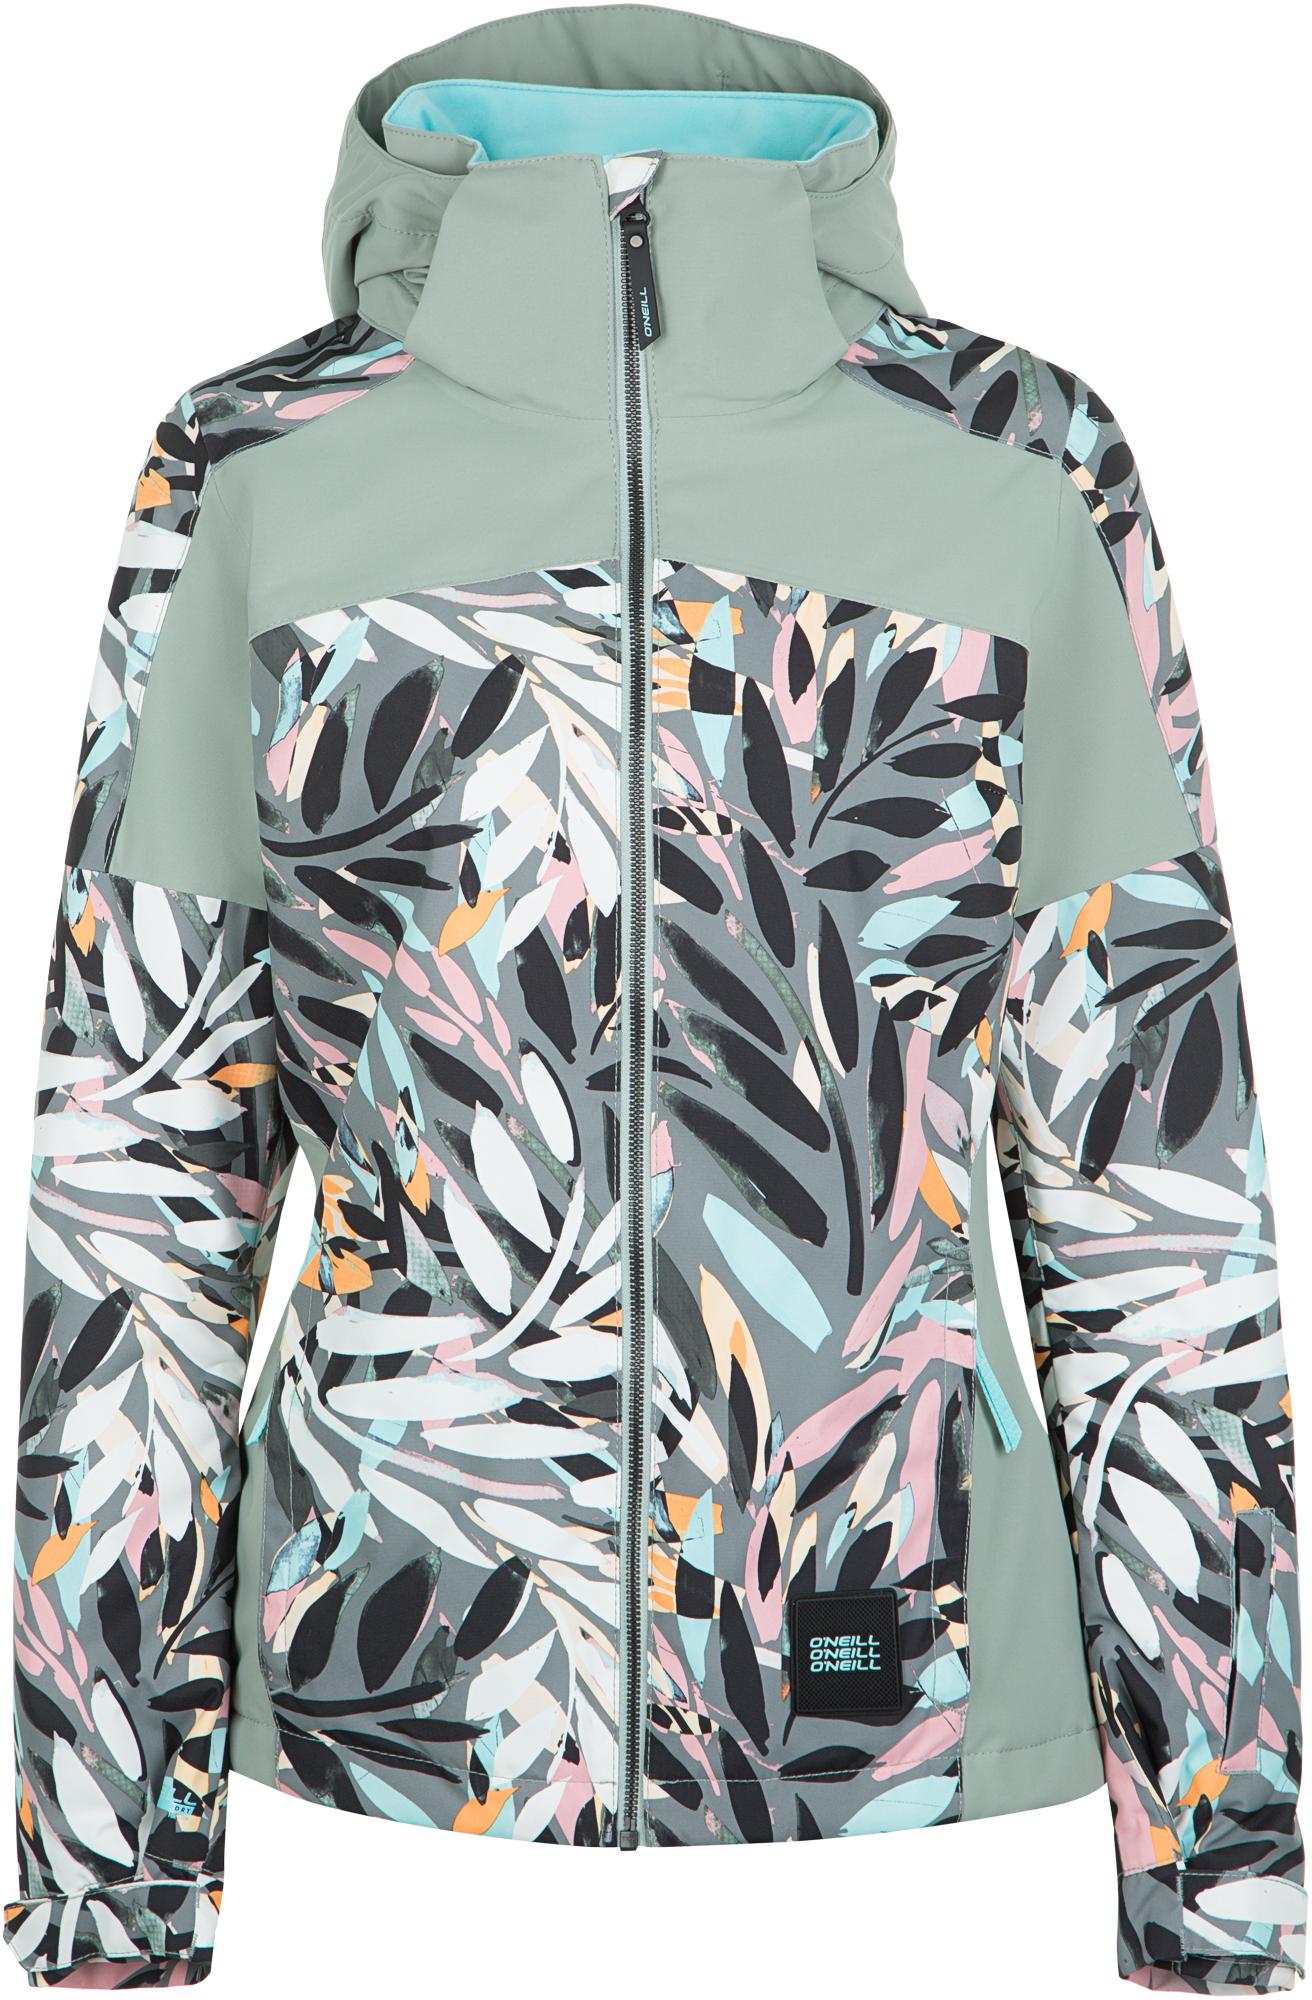 цена O'Neill Куртка утепленная женская O'Neill Pw Wavelite, размер 42-44 онлайн в 2017 году